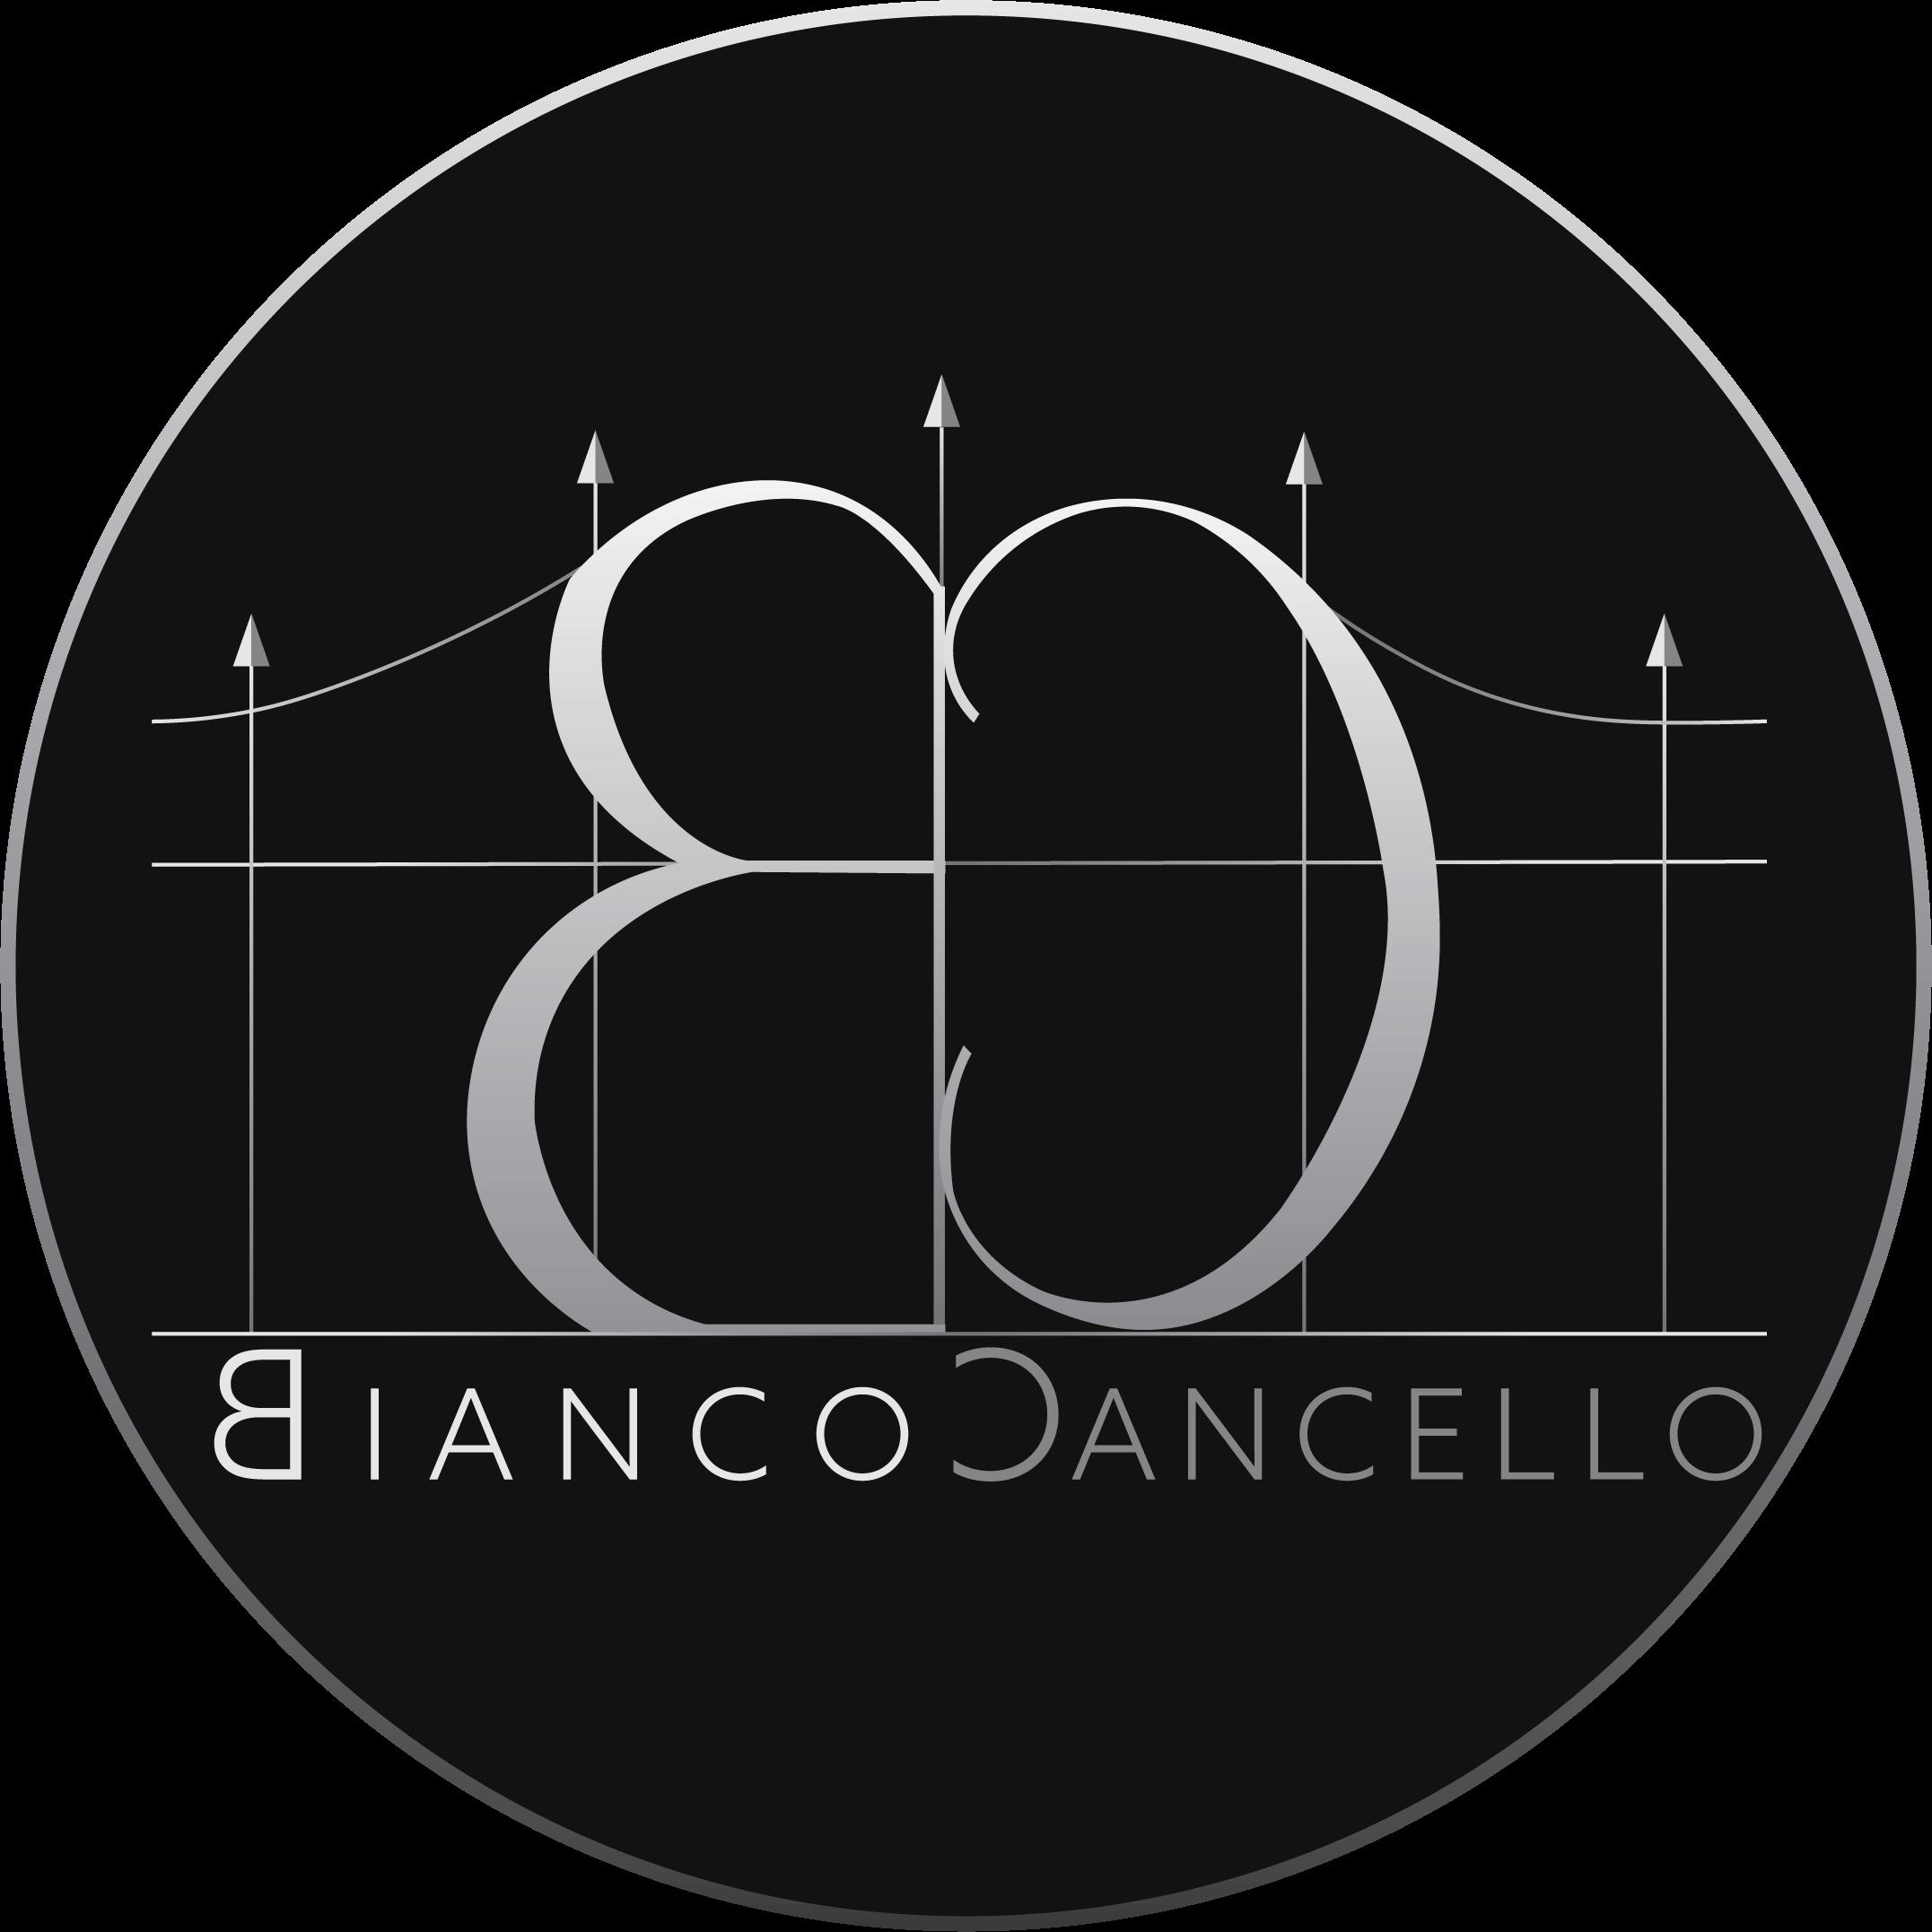 BiancoCancello